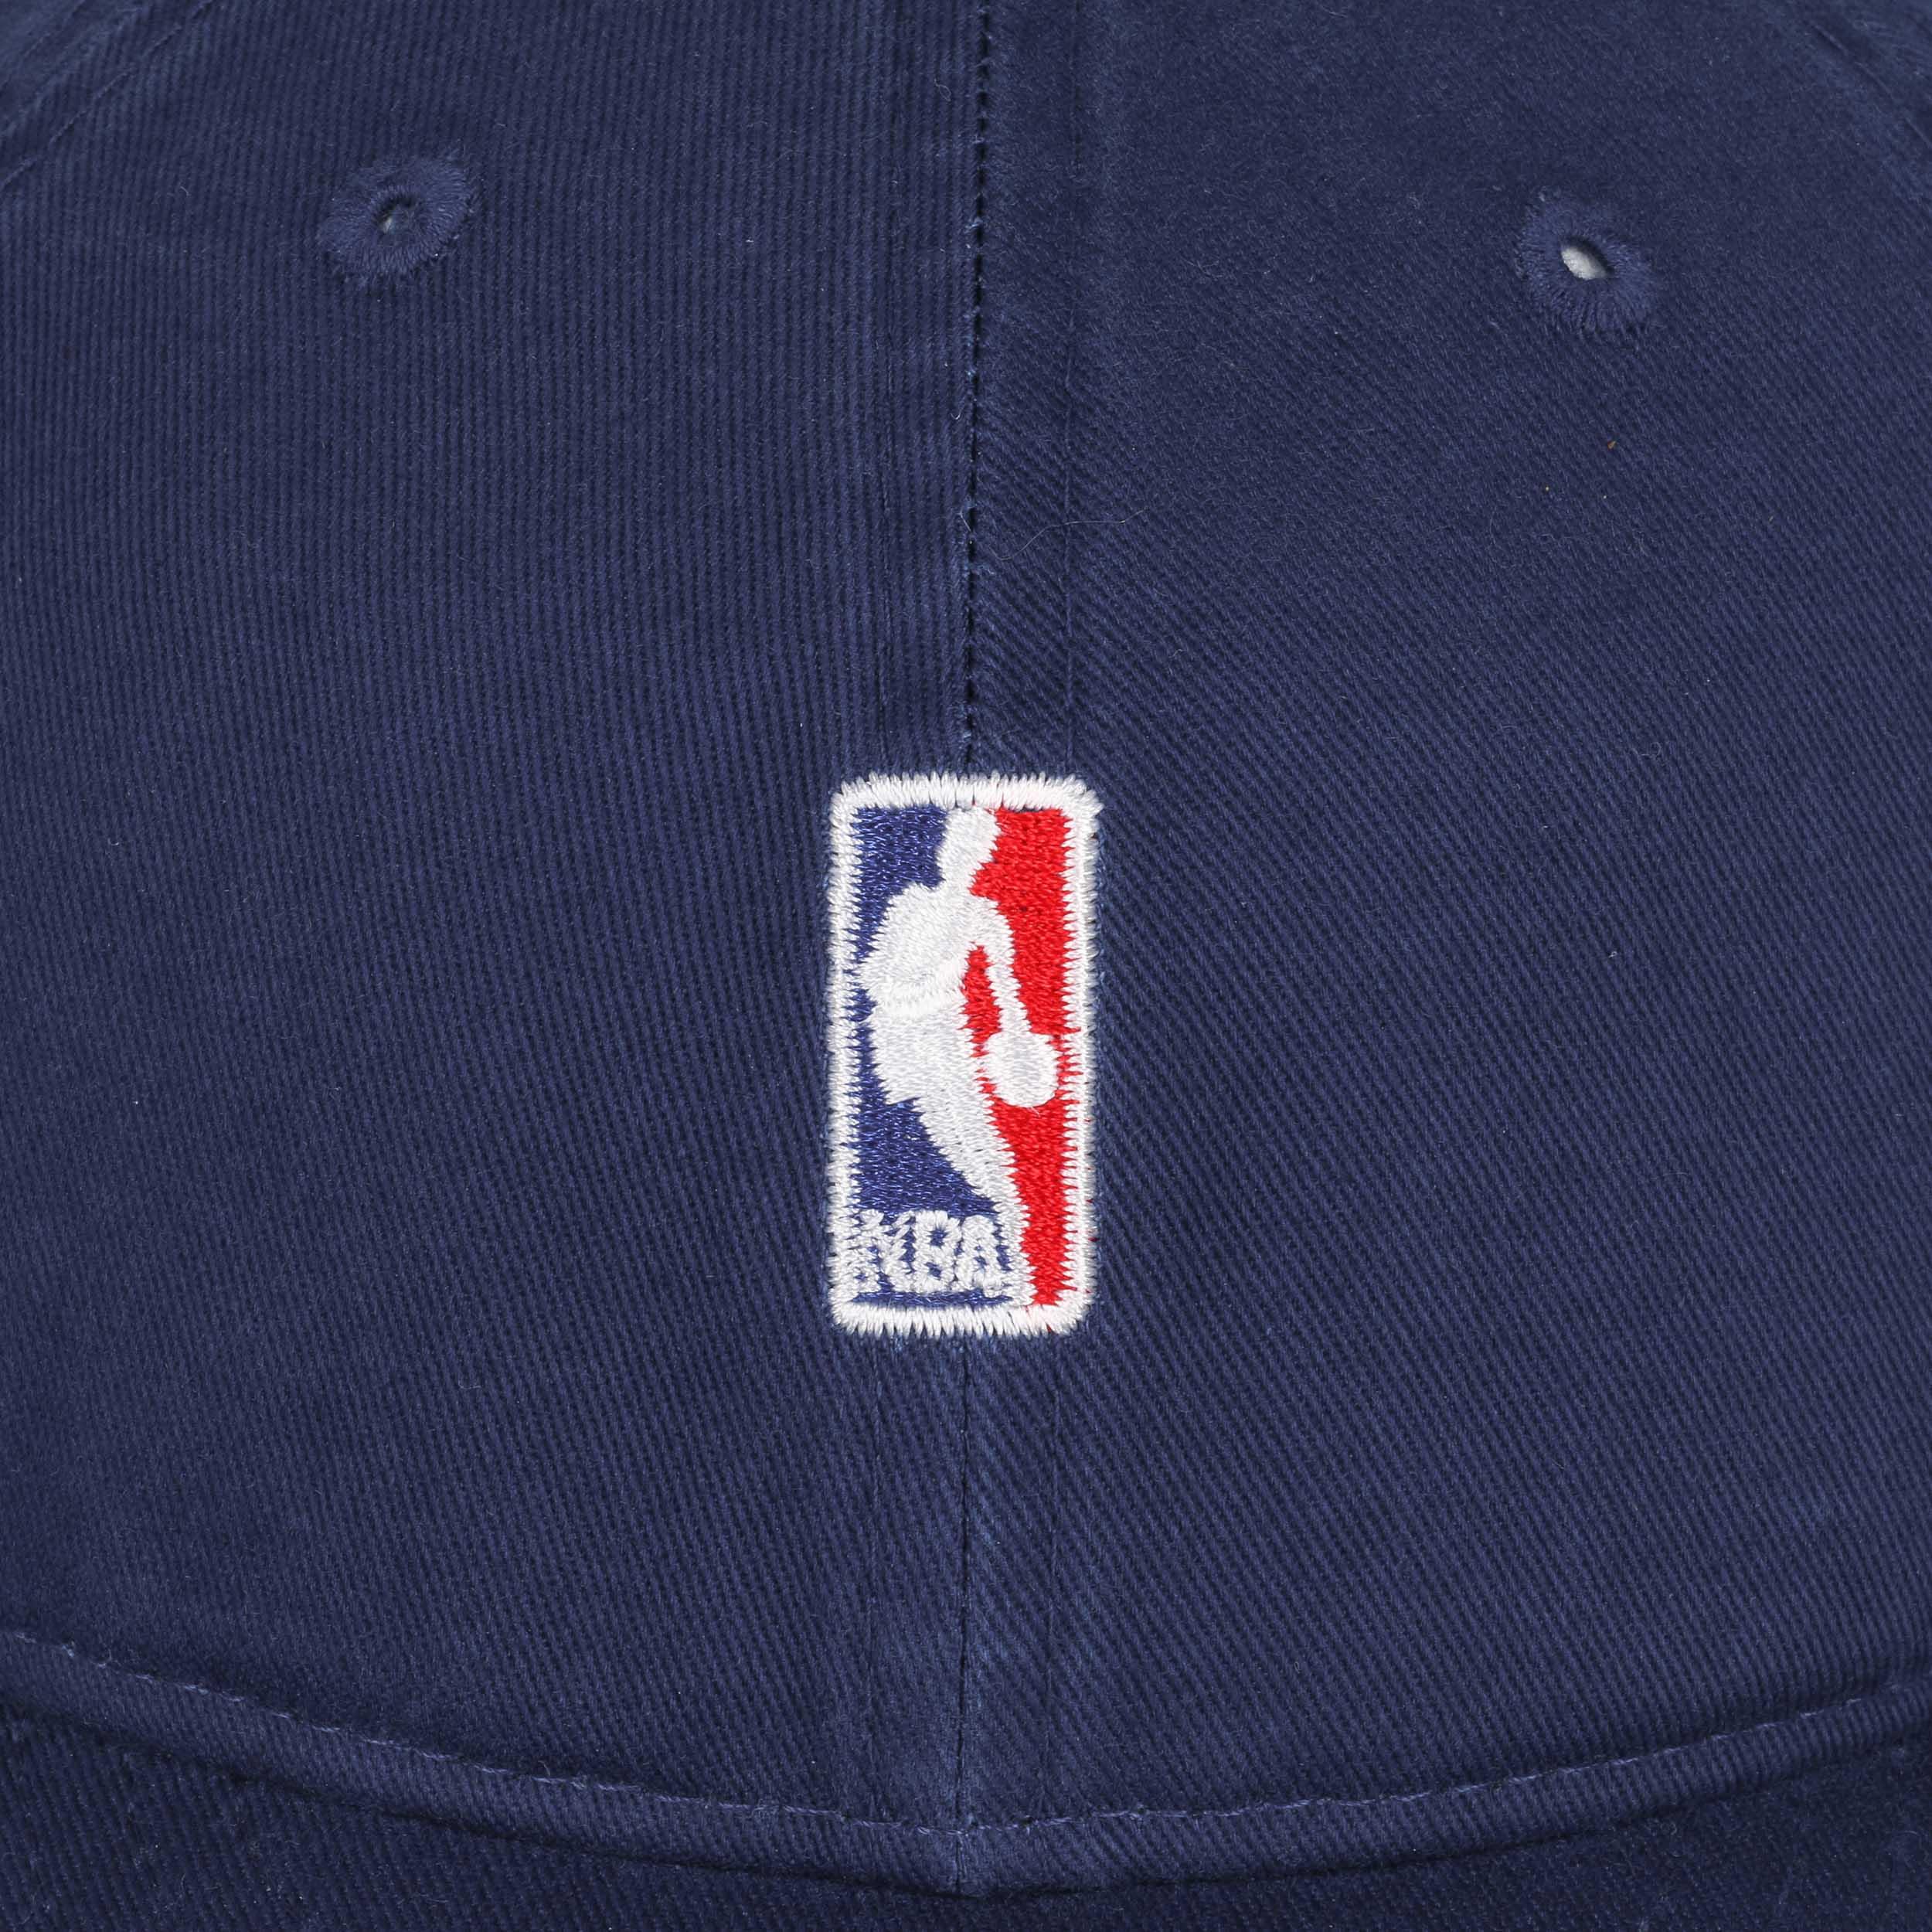 d2a15fb6f6374 ... 9Fifty Low Crown NBA Logo Cap by New Era - royal-blue 4 ...